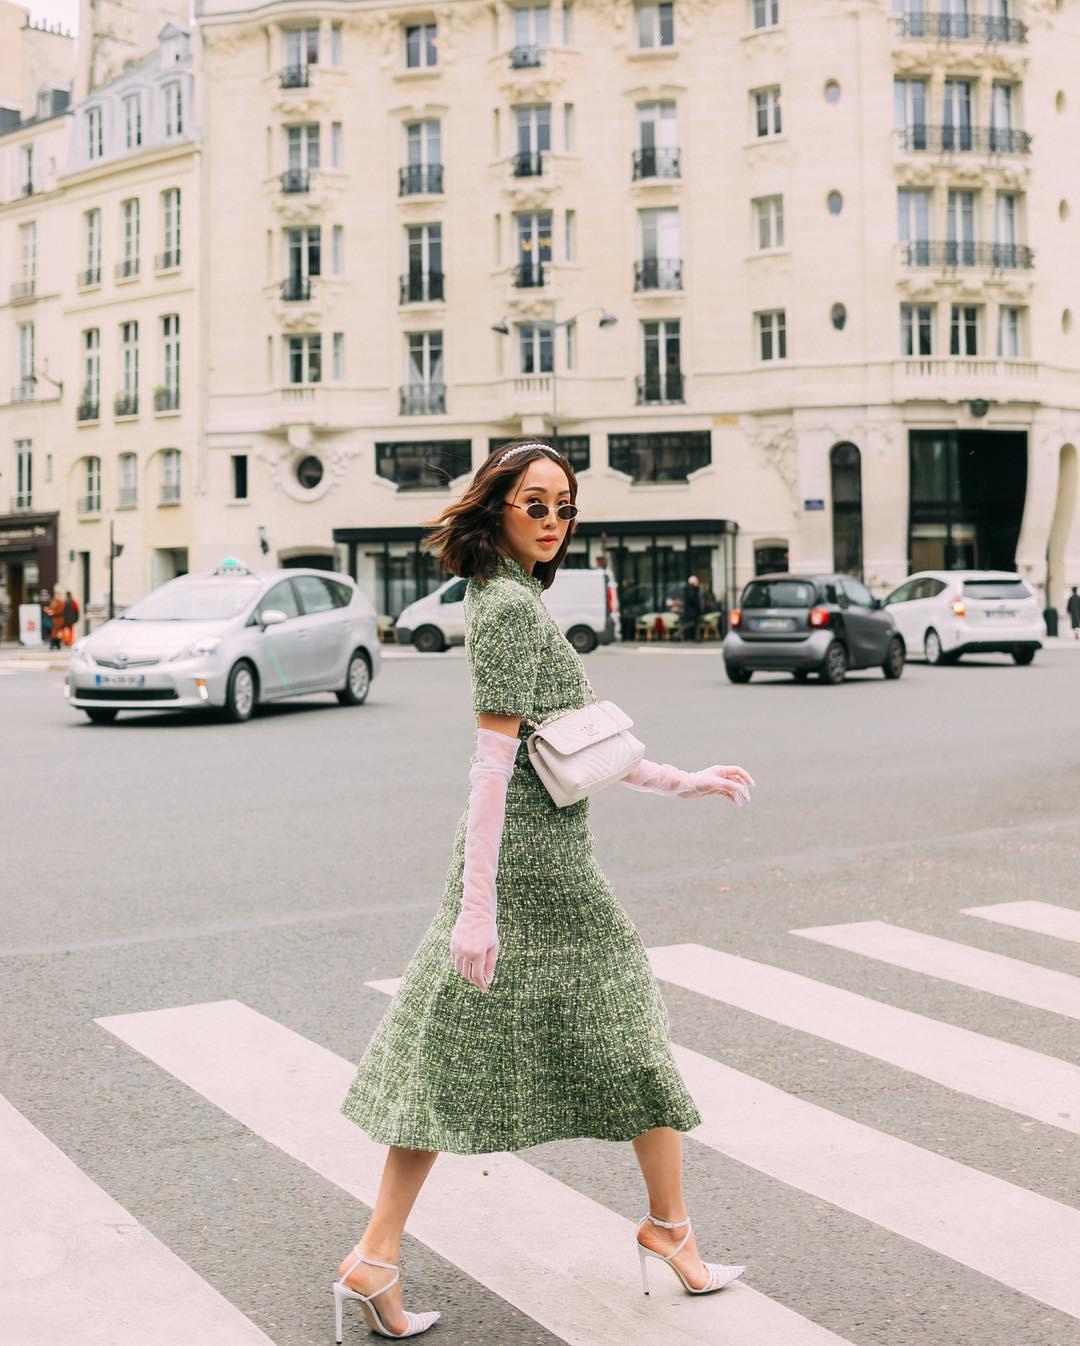 Dress code formal - Chriselle Lim mặc đầm vải tweed màu xanh lá